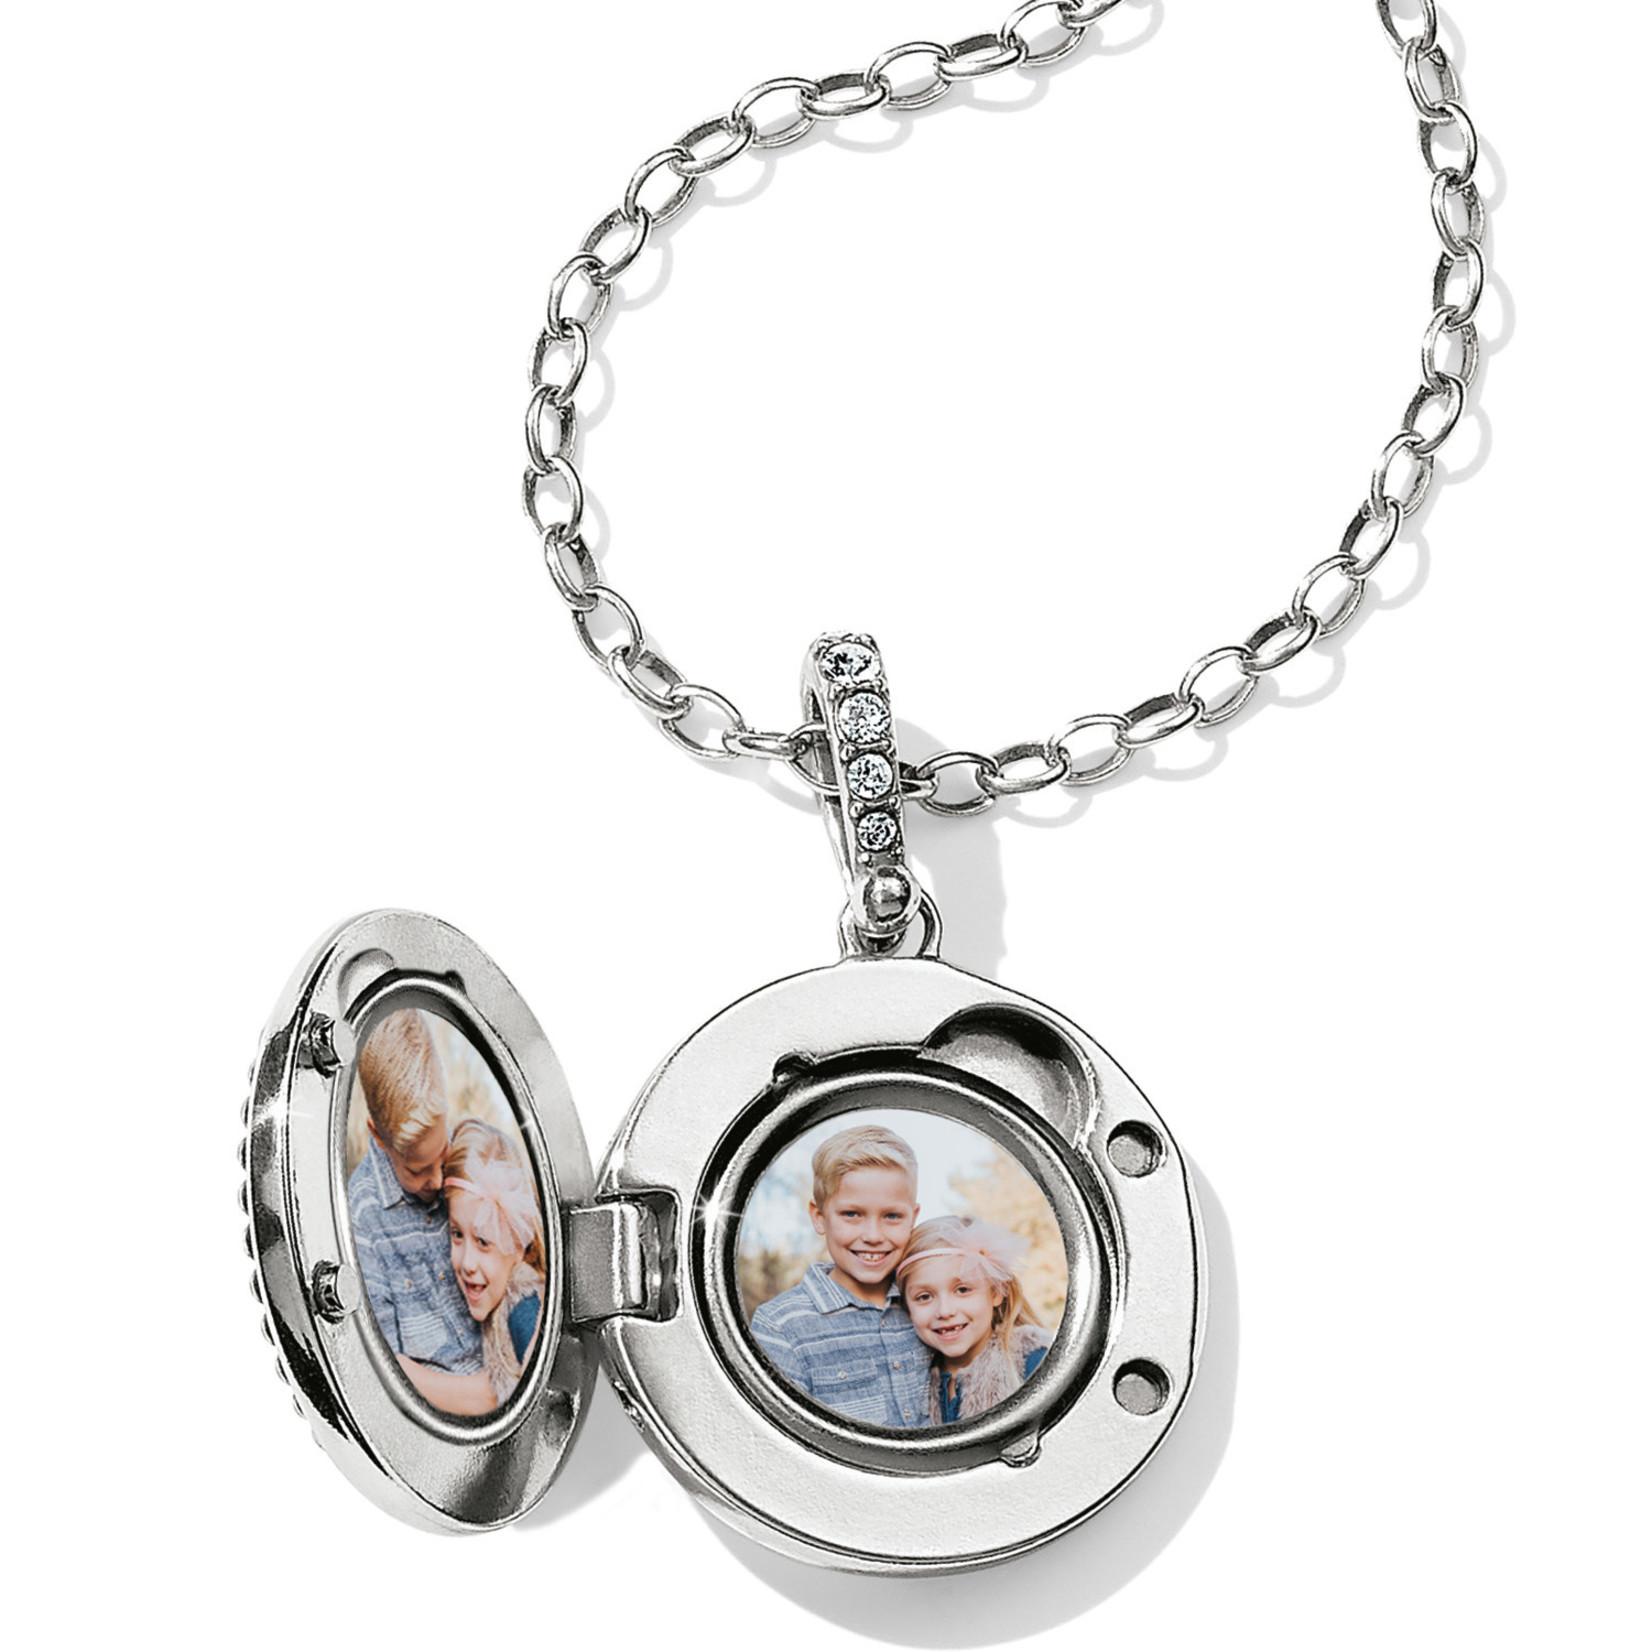 Brighton Twinkle Small Round Locket Necklace